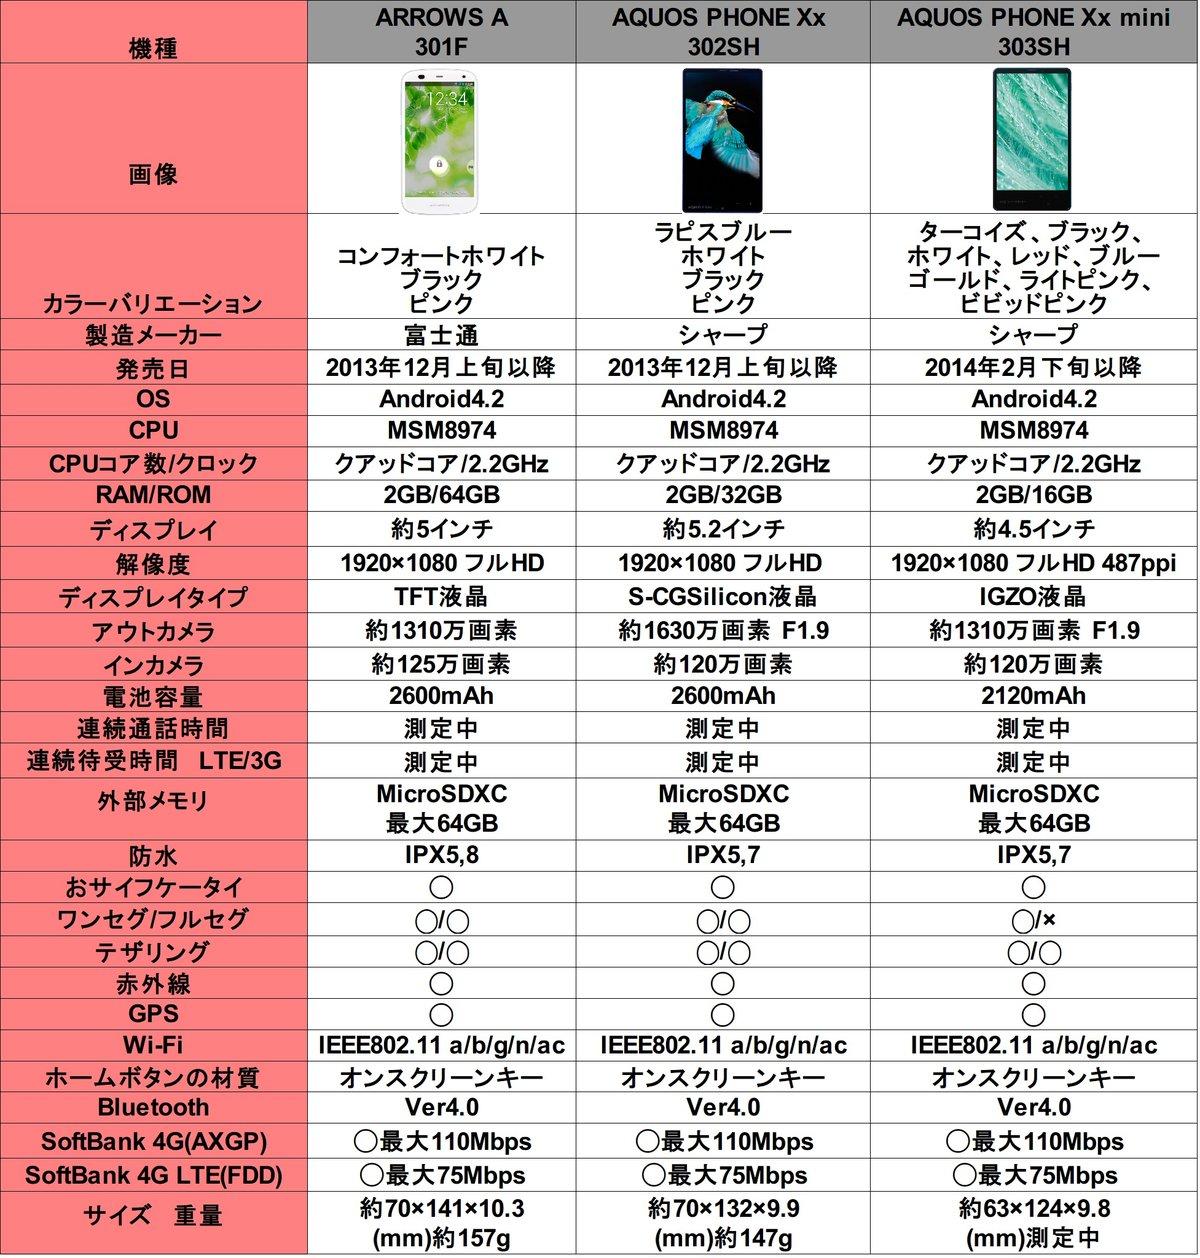 2f94df75eb SoftBankの冬春モデル「AQUOS PHONE Xx 302SH」「ARROWS A 301F」が明日 ...